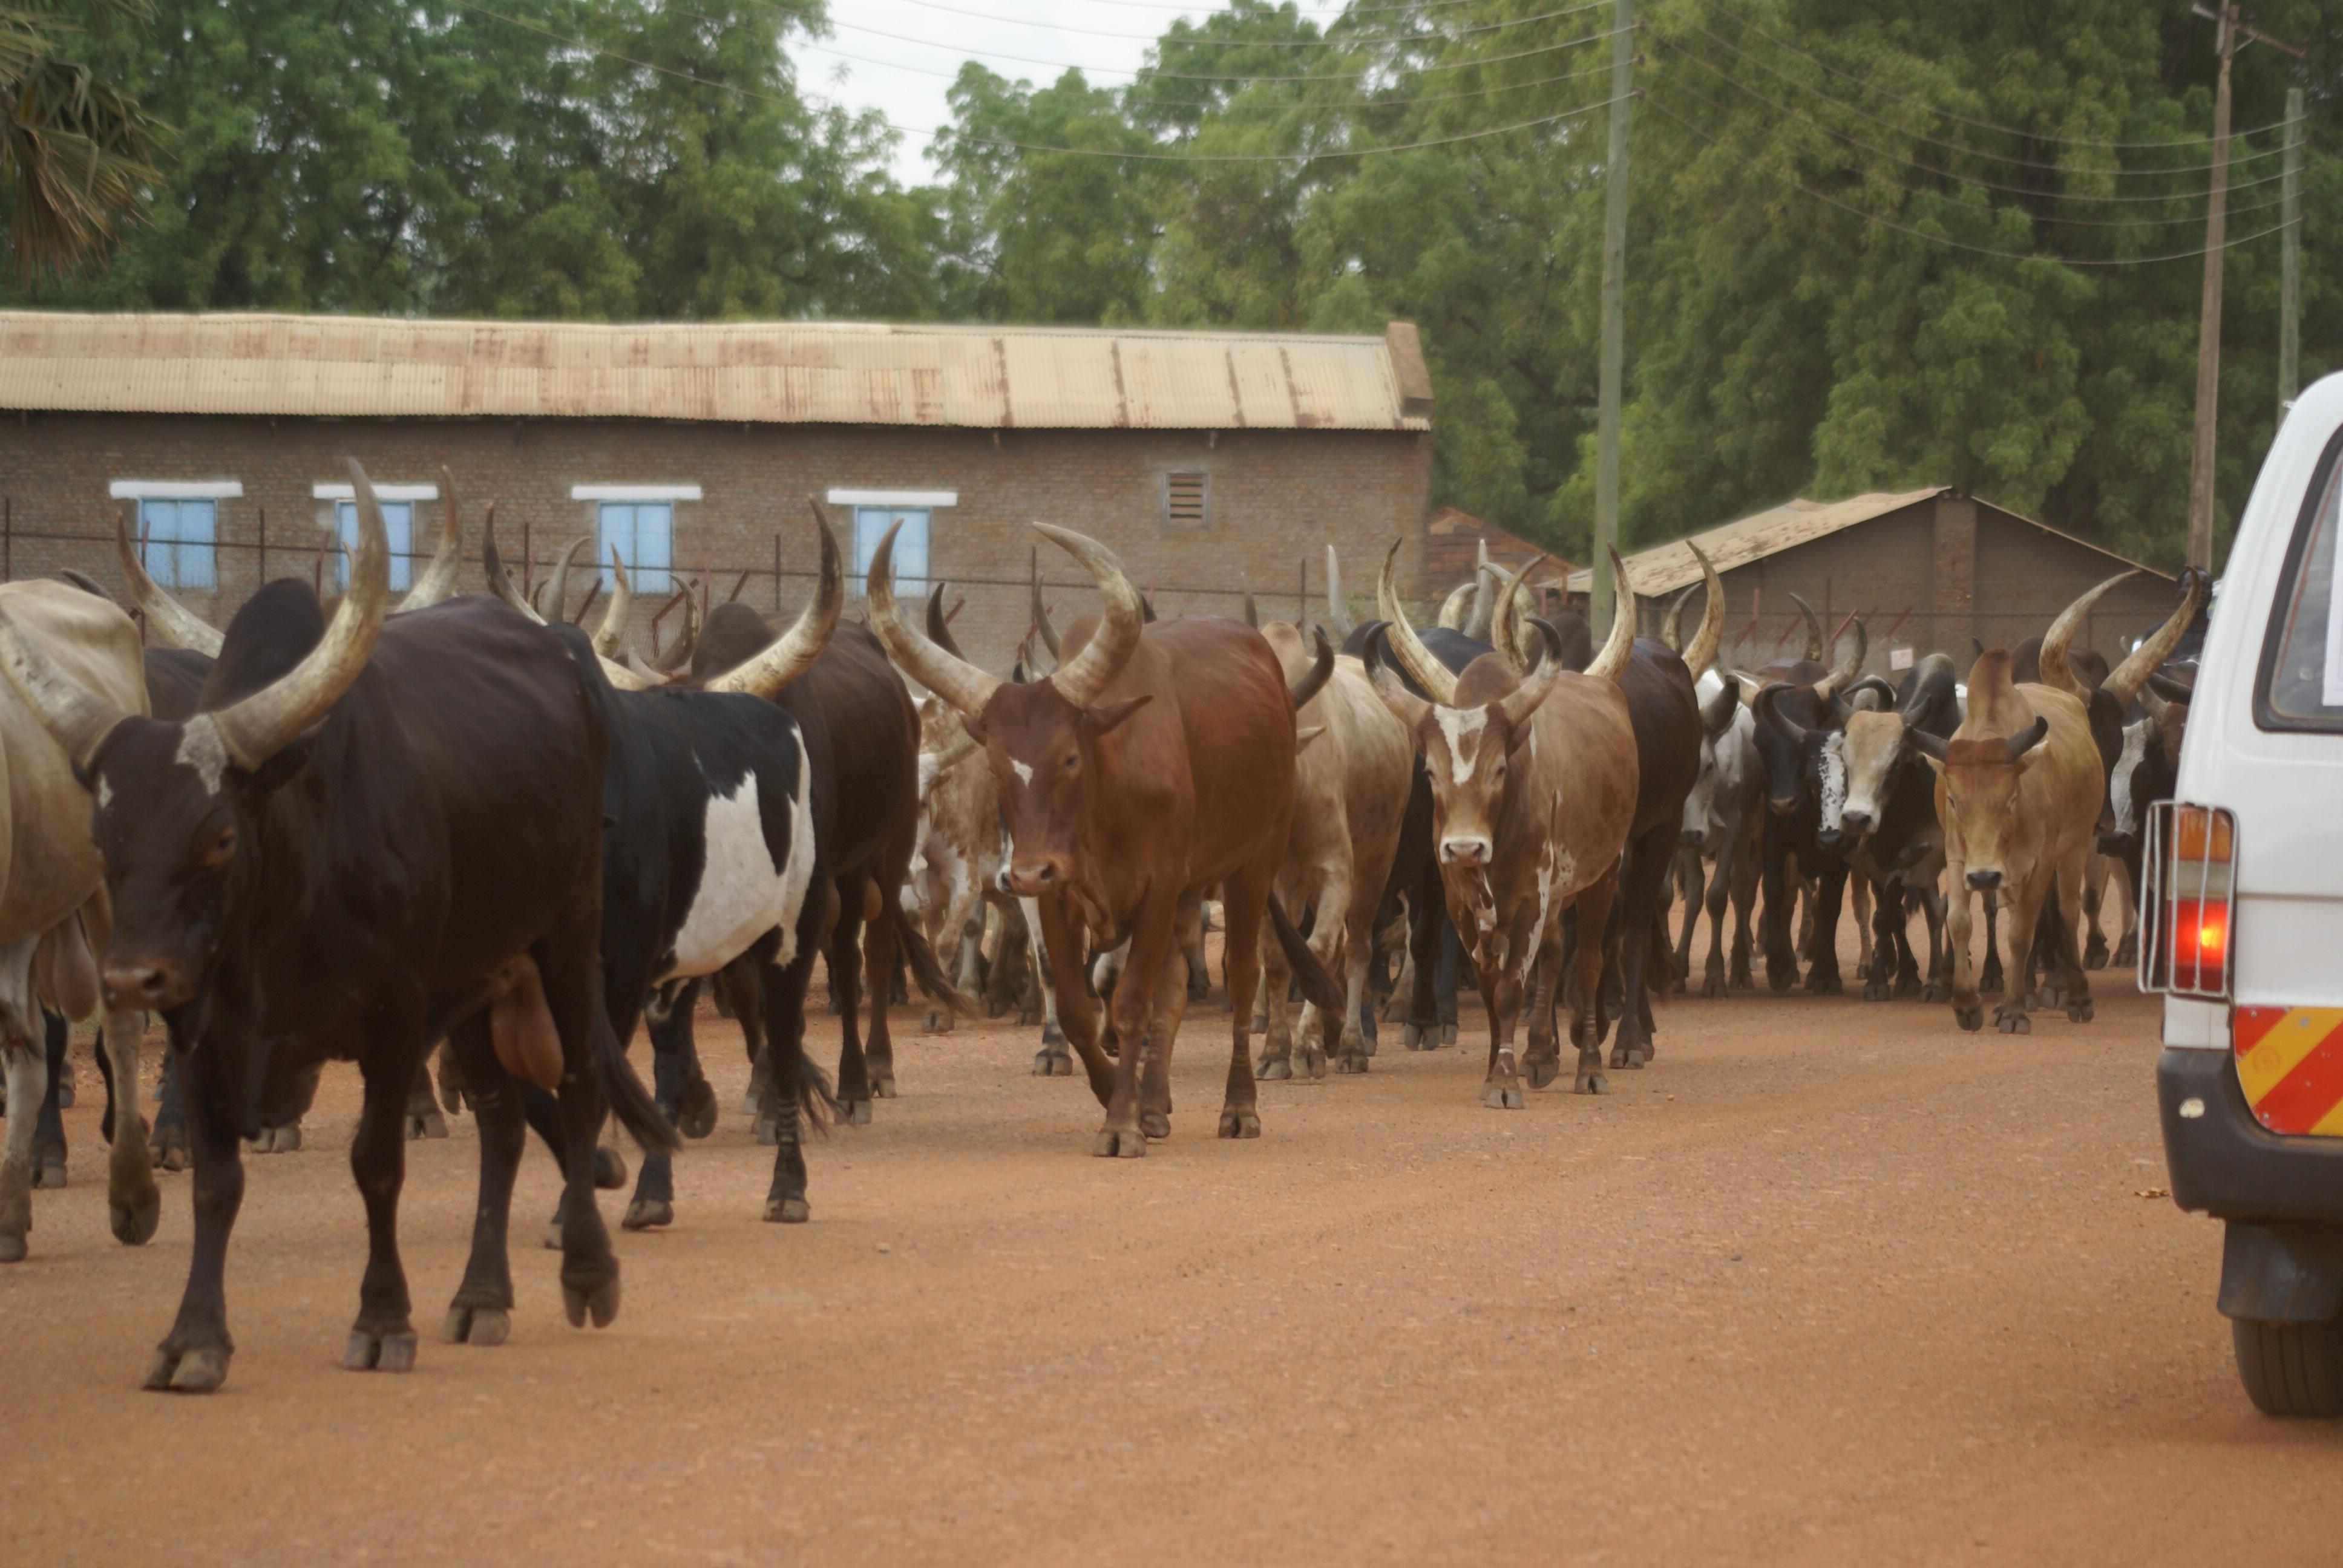 File:Cattle of the Dinka people, Juba, South Sudan - 20101230-05 jpg